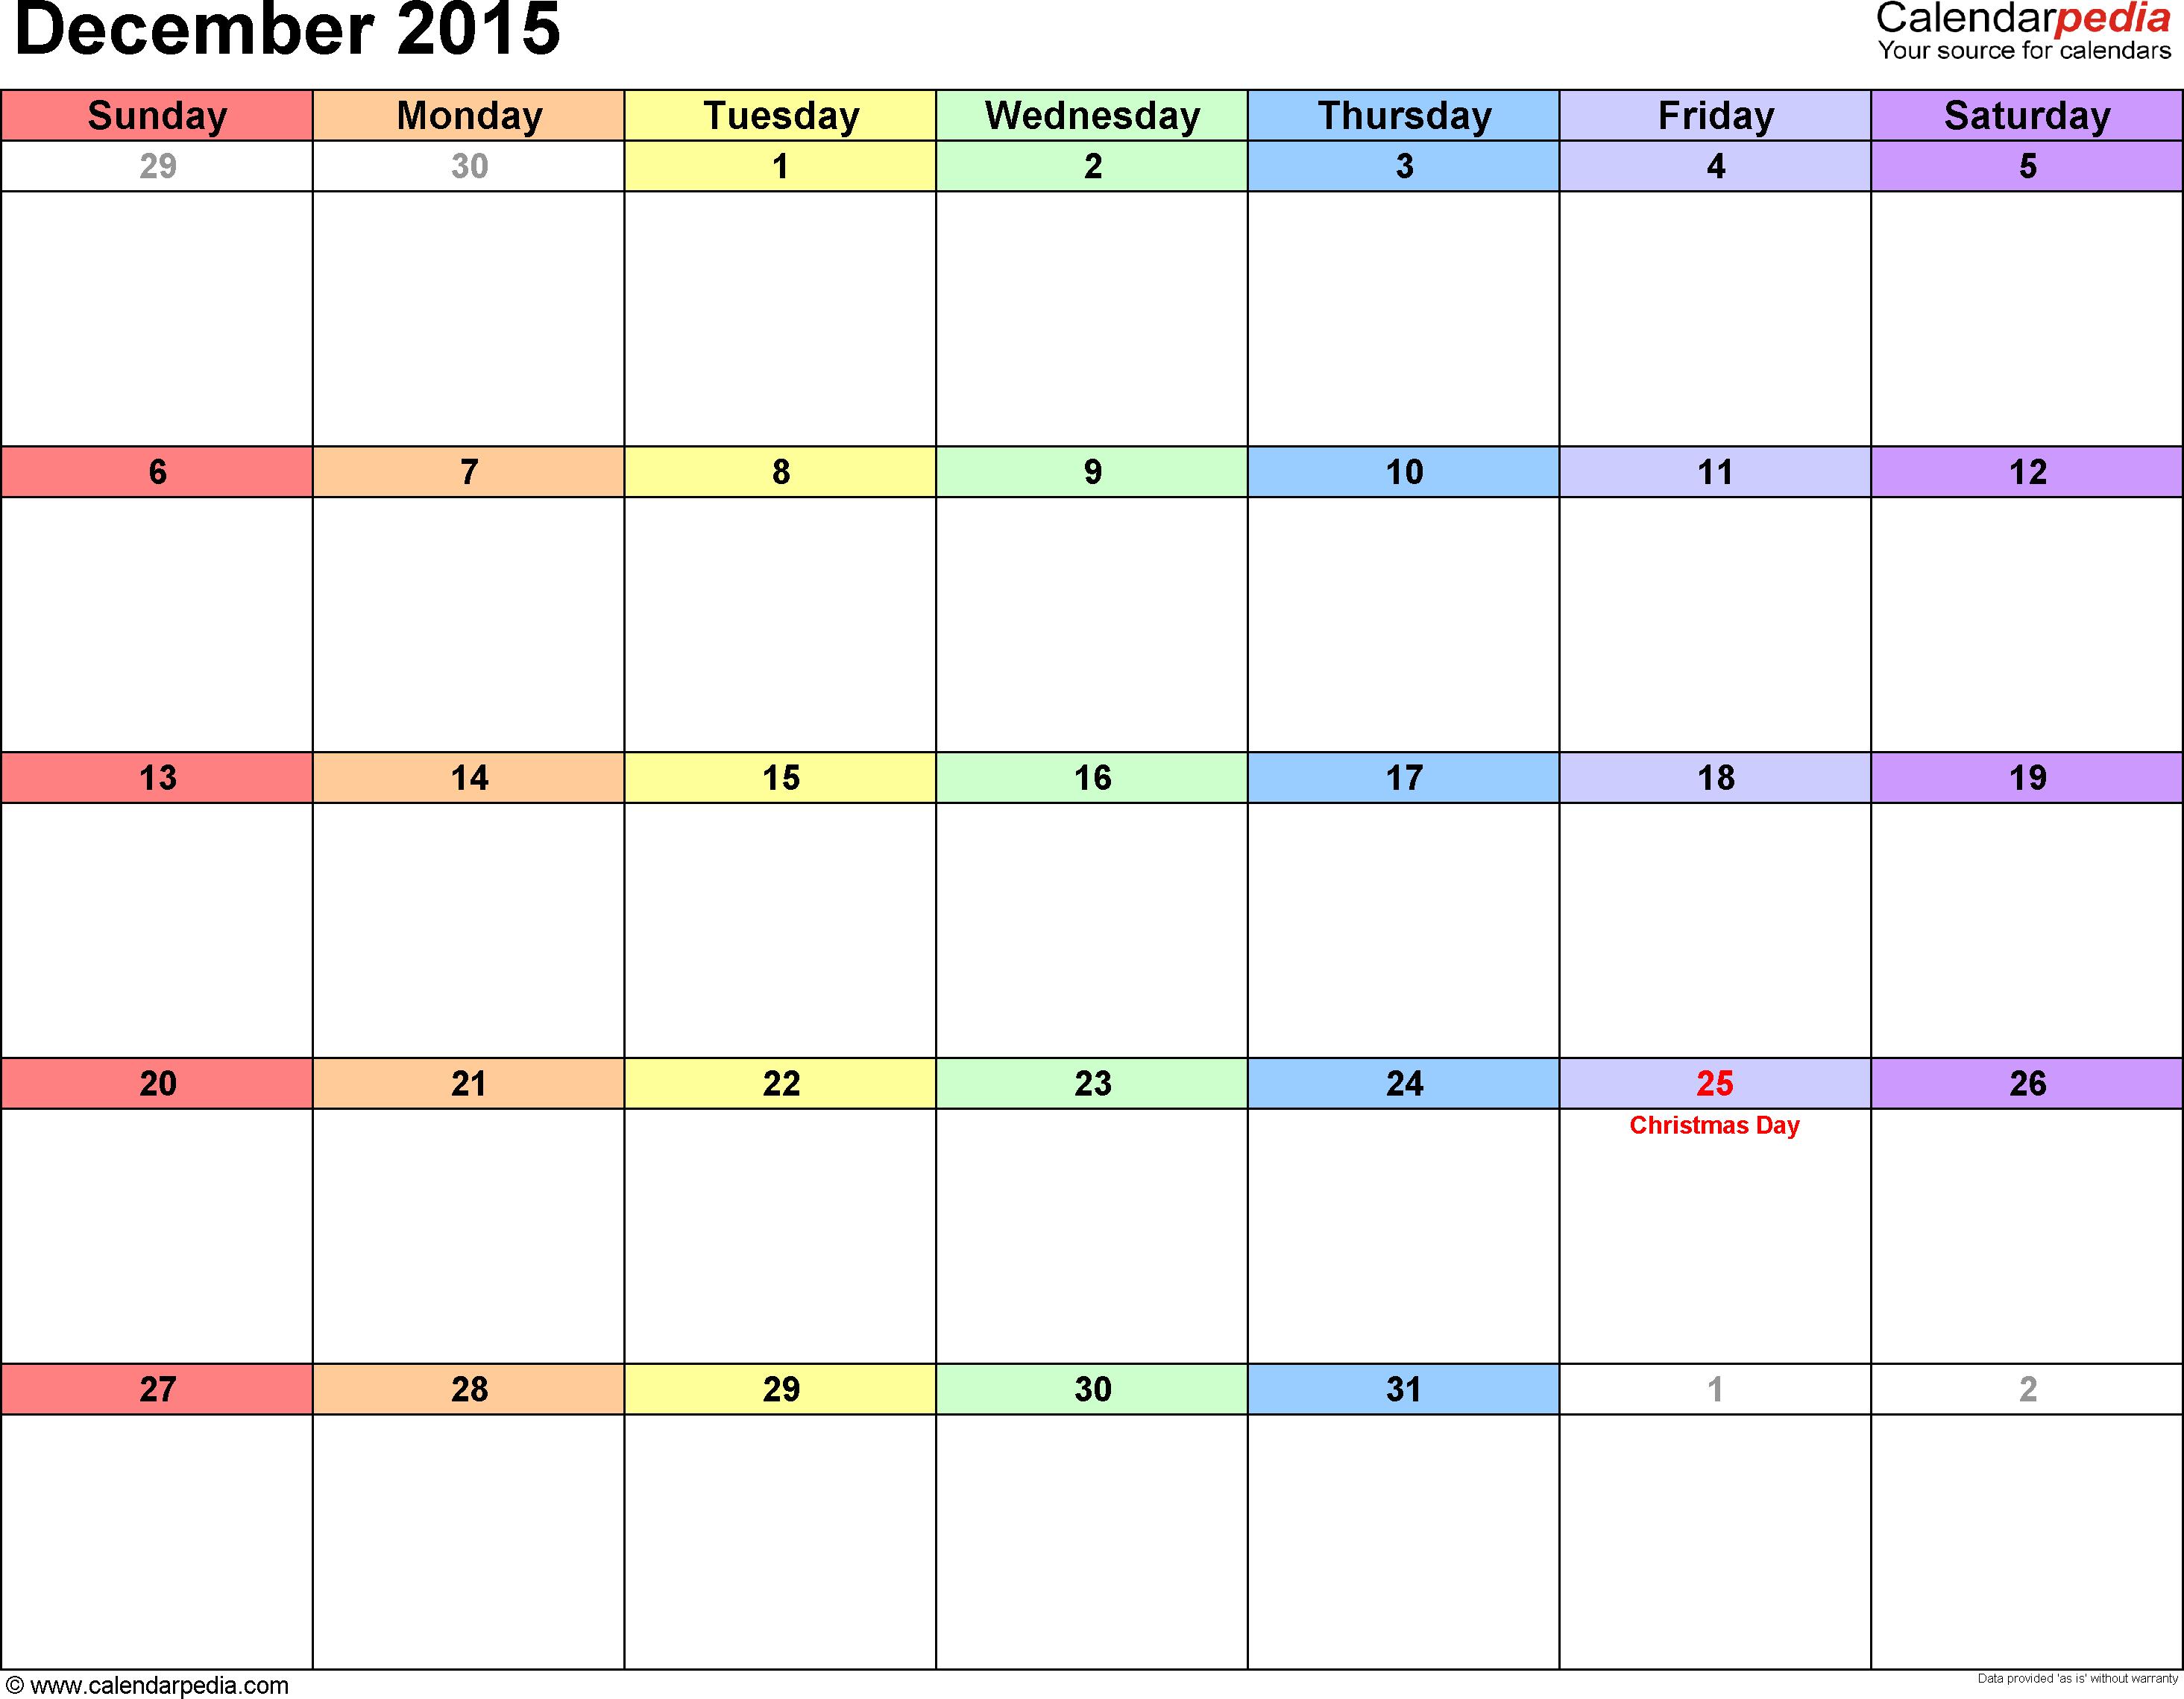 December 2015 calendar printable template